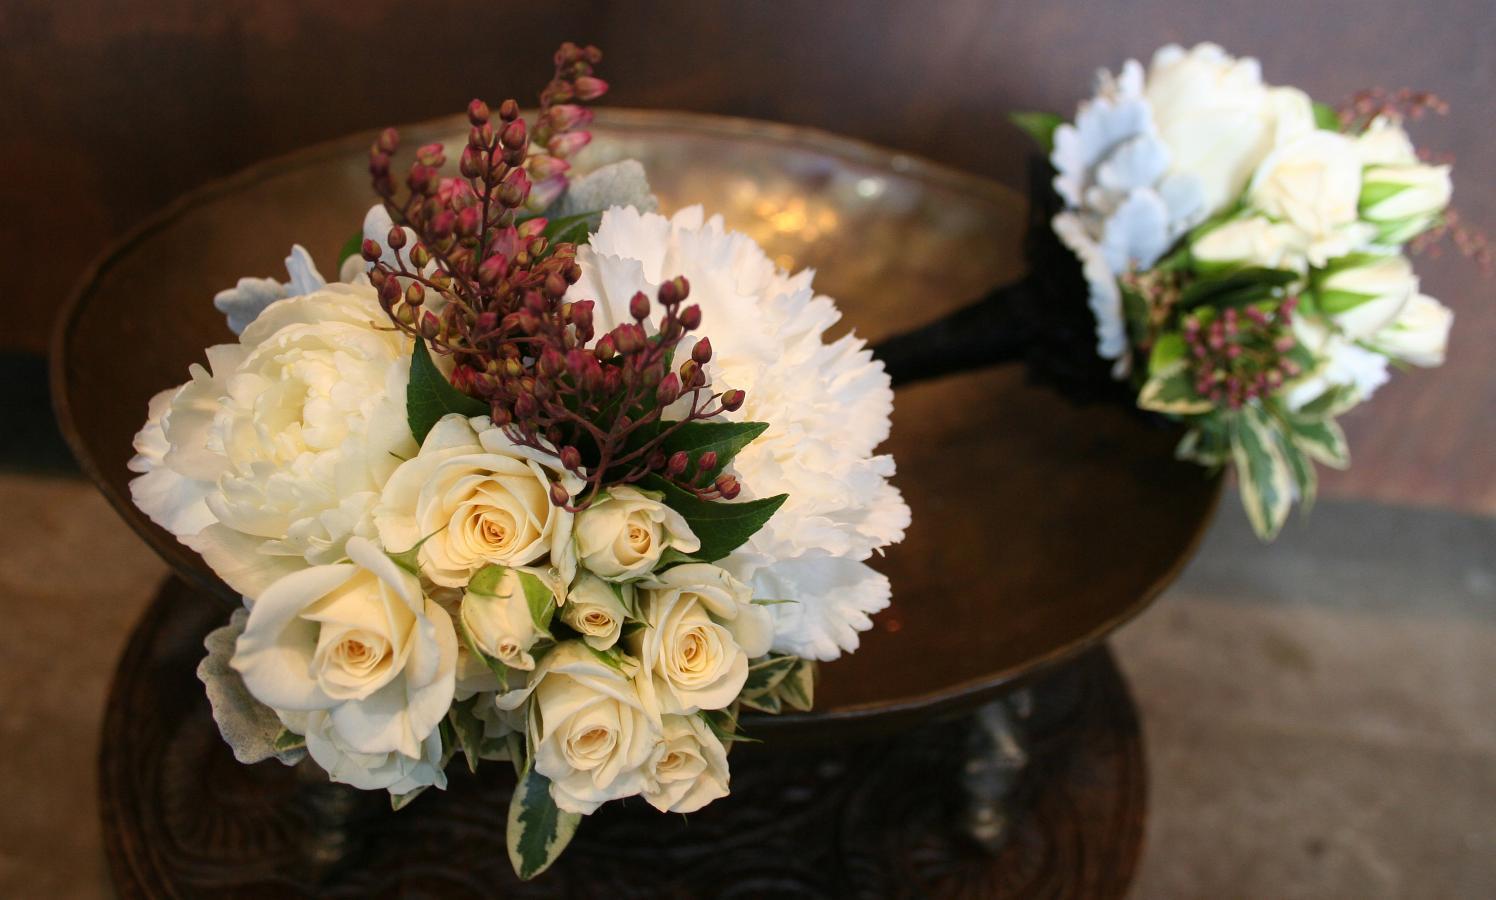 Wedding Gift Baskets Brisbane : Wedding Flowers Brisbane Brisbane Wedding Florists Bridal Flowers